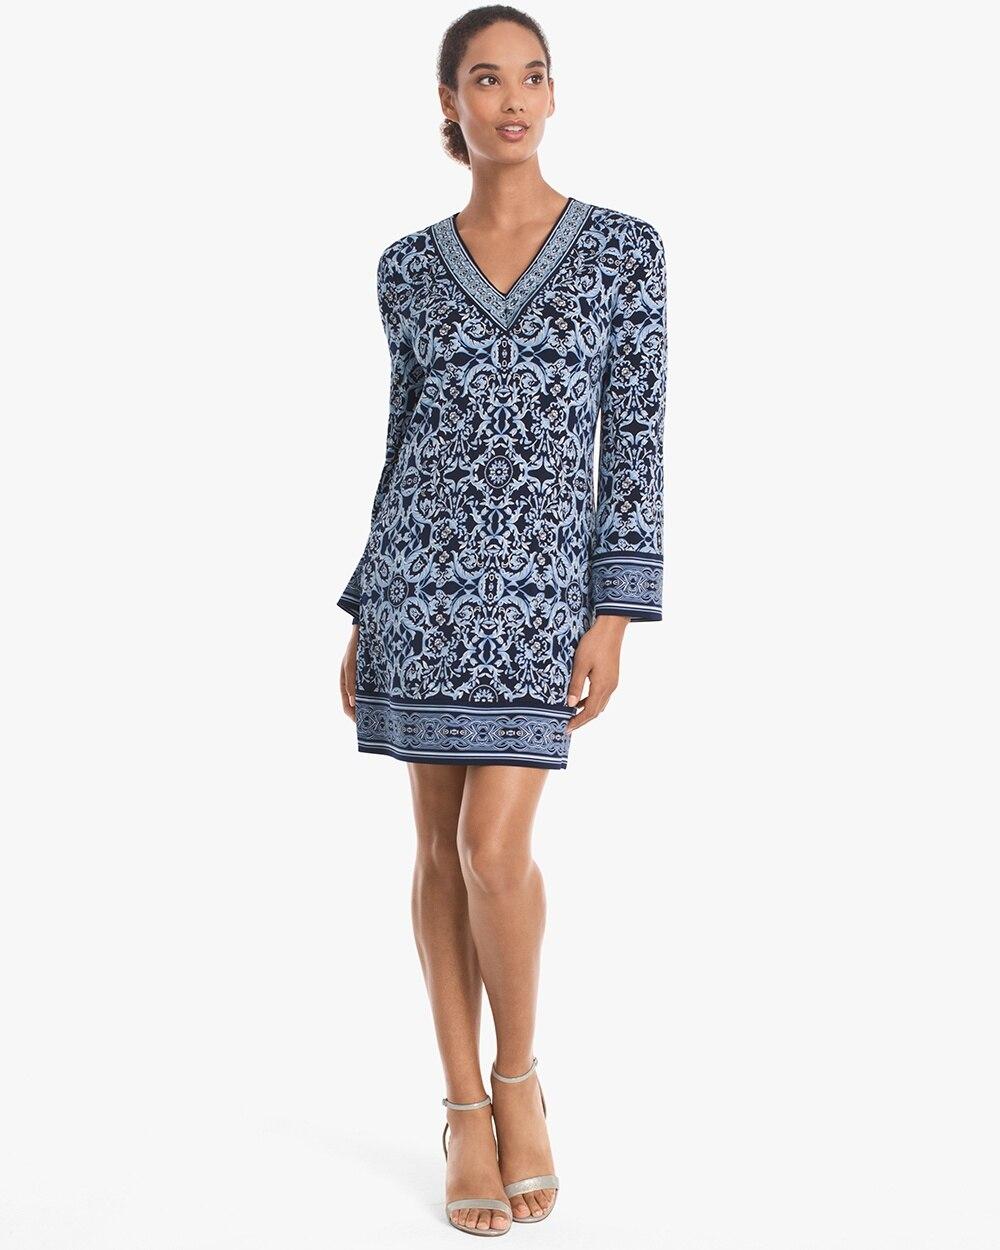 36984e146a Long-Sleeve Printed Knit Shift Dress - White House Black Market